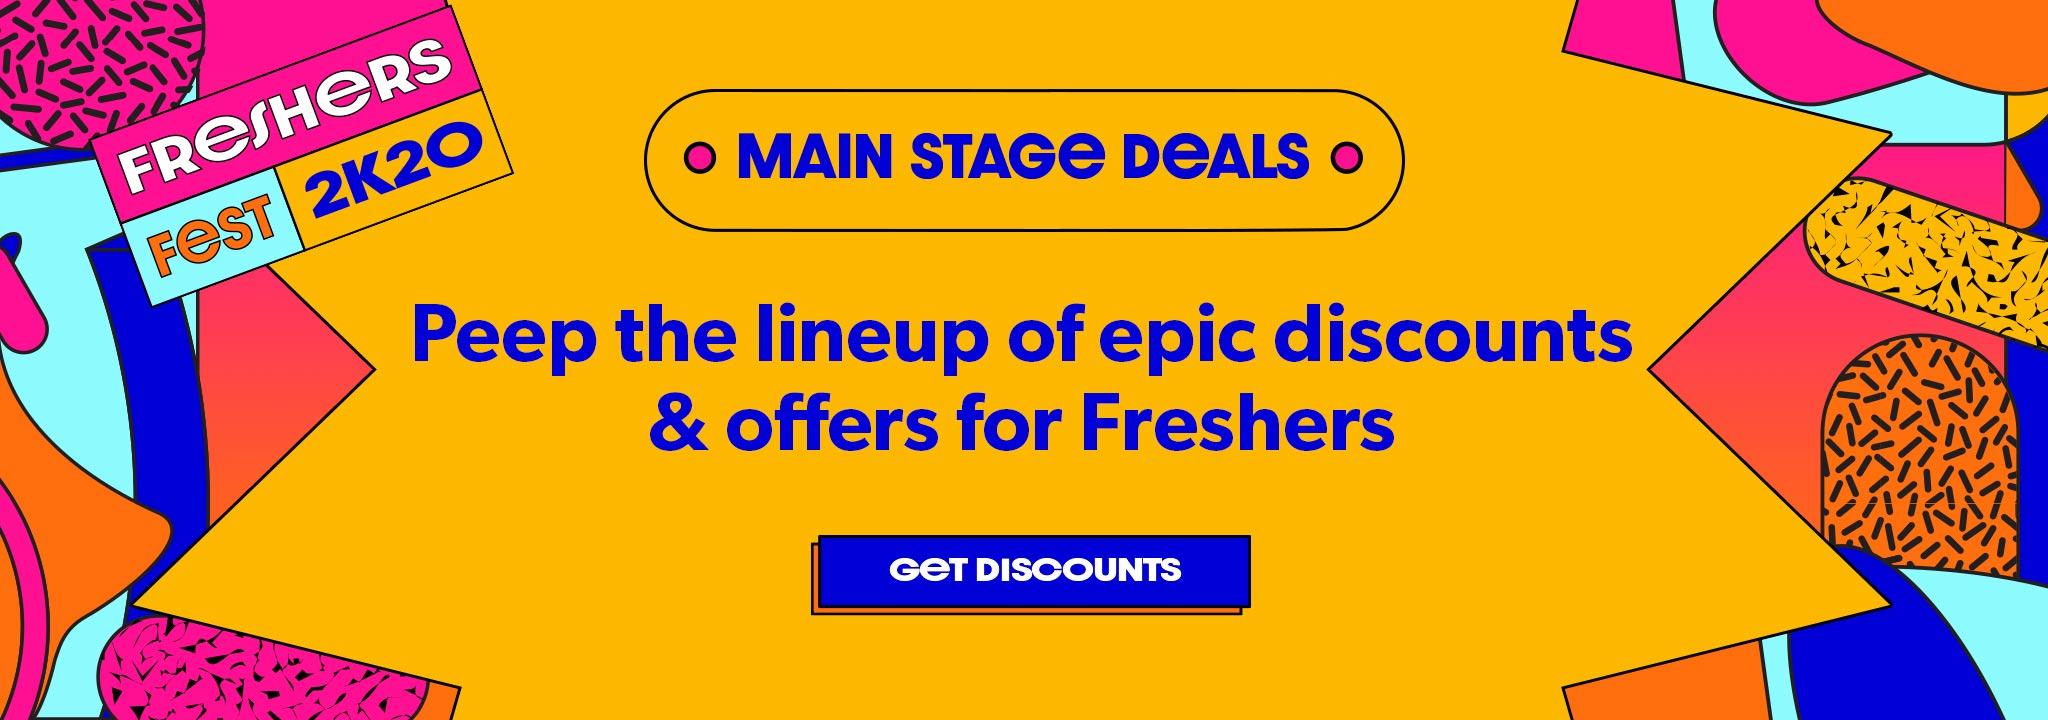 Main Stage Deals